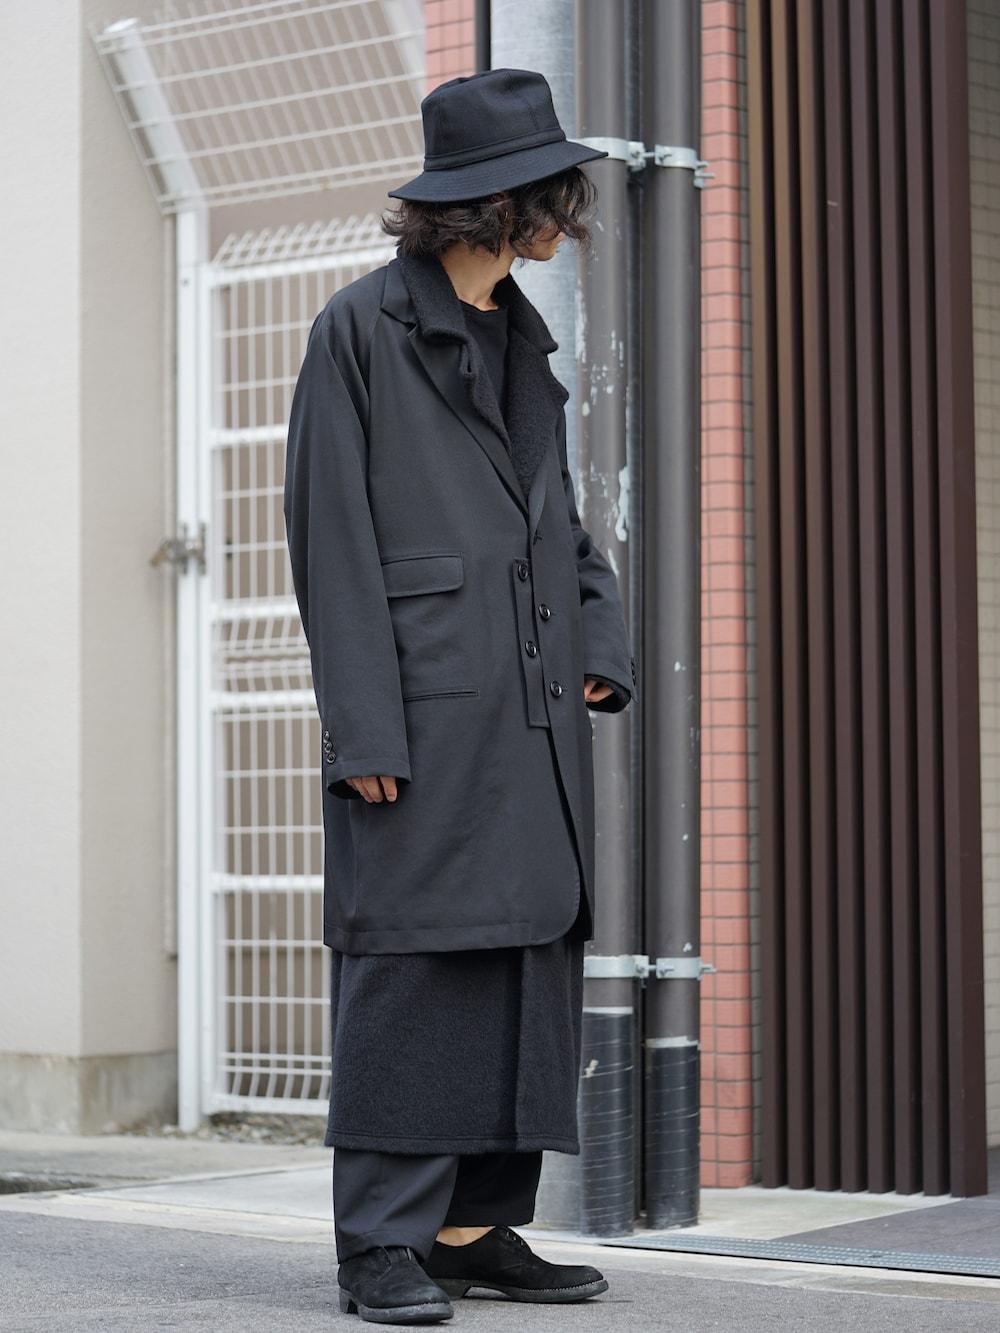 Yohji Yamamoto Coat On Jacket Style 02